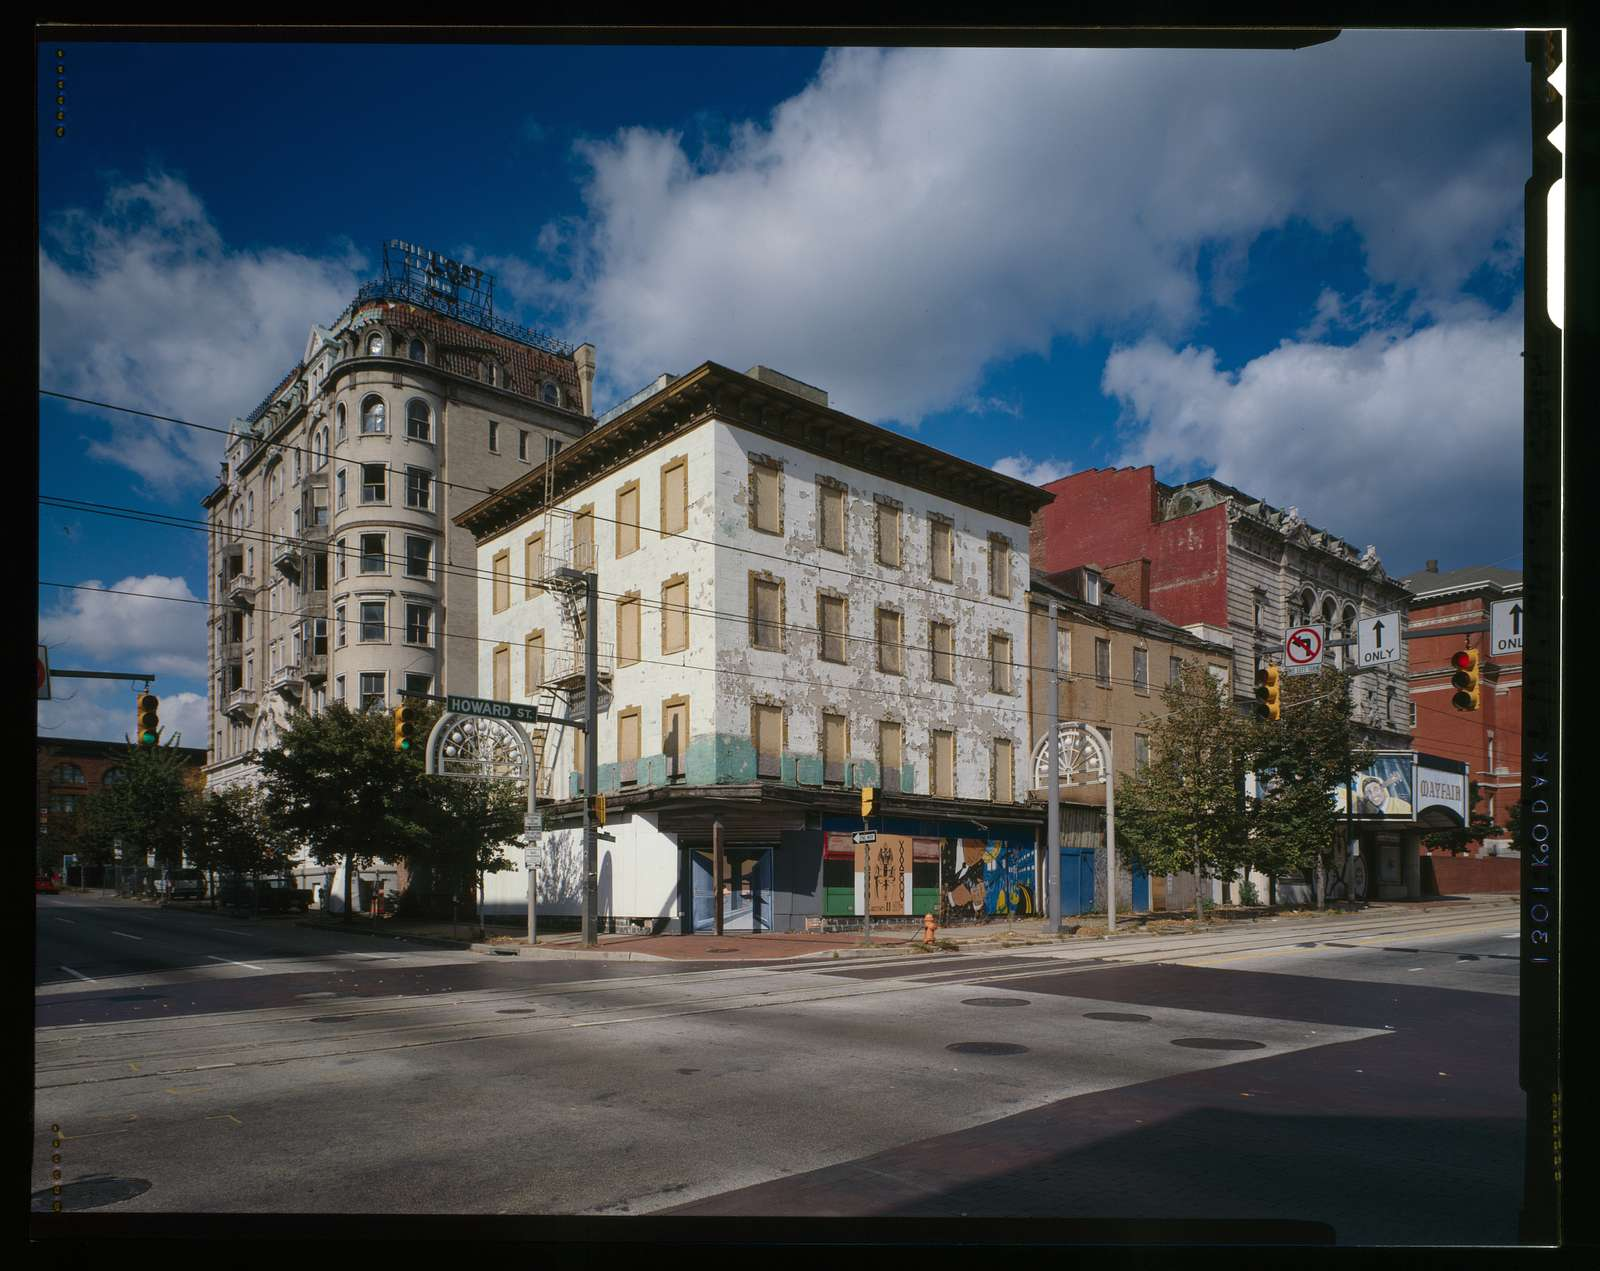 Hotel Kernan, West Franklin Street, Baltimore, Independent City, MD